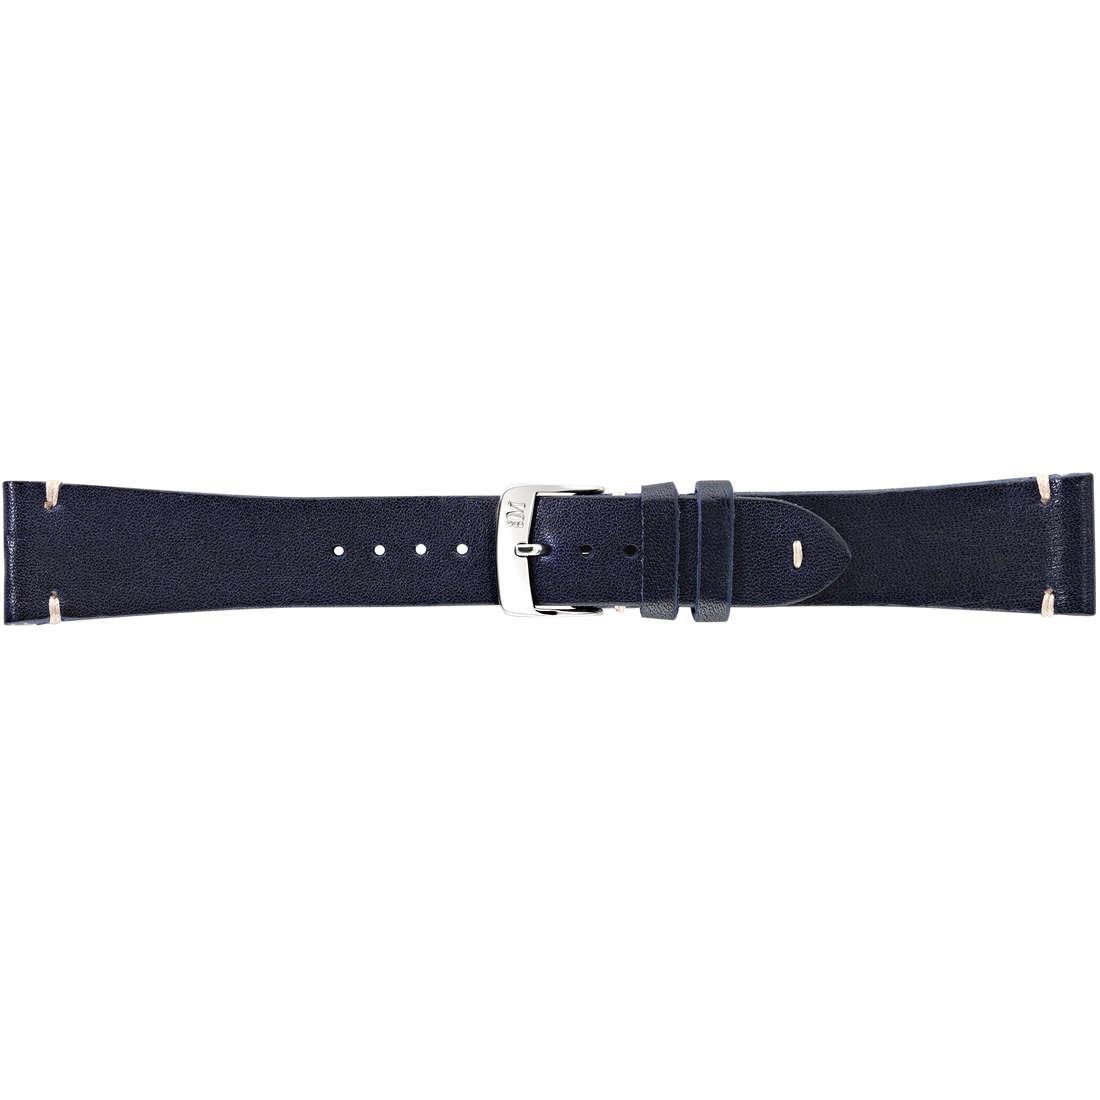 montre bande de montres homme Morellato Manufatti A01X4541A76062CR18